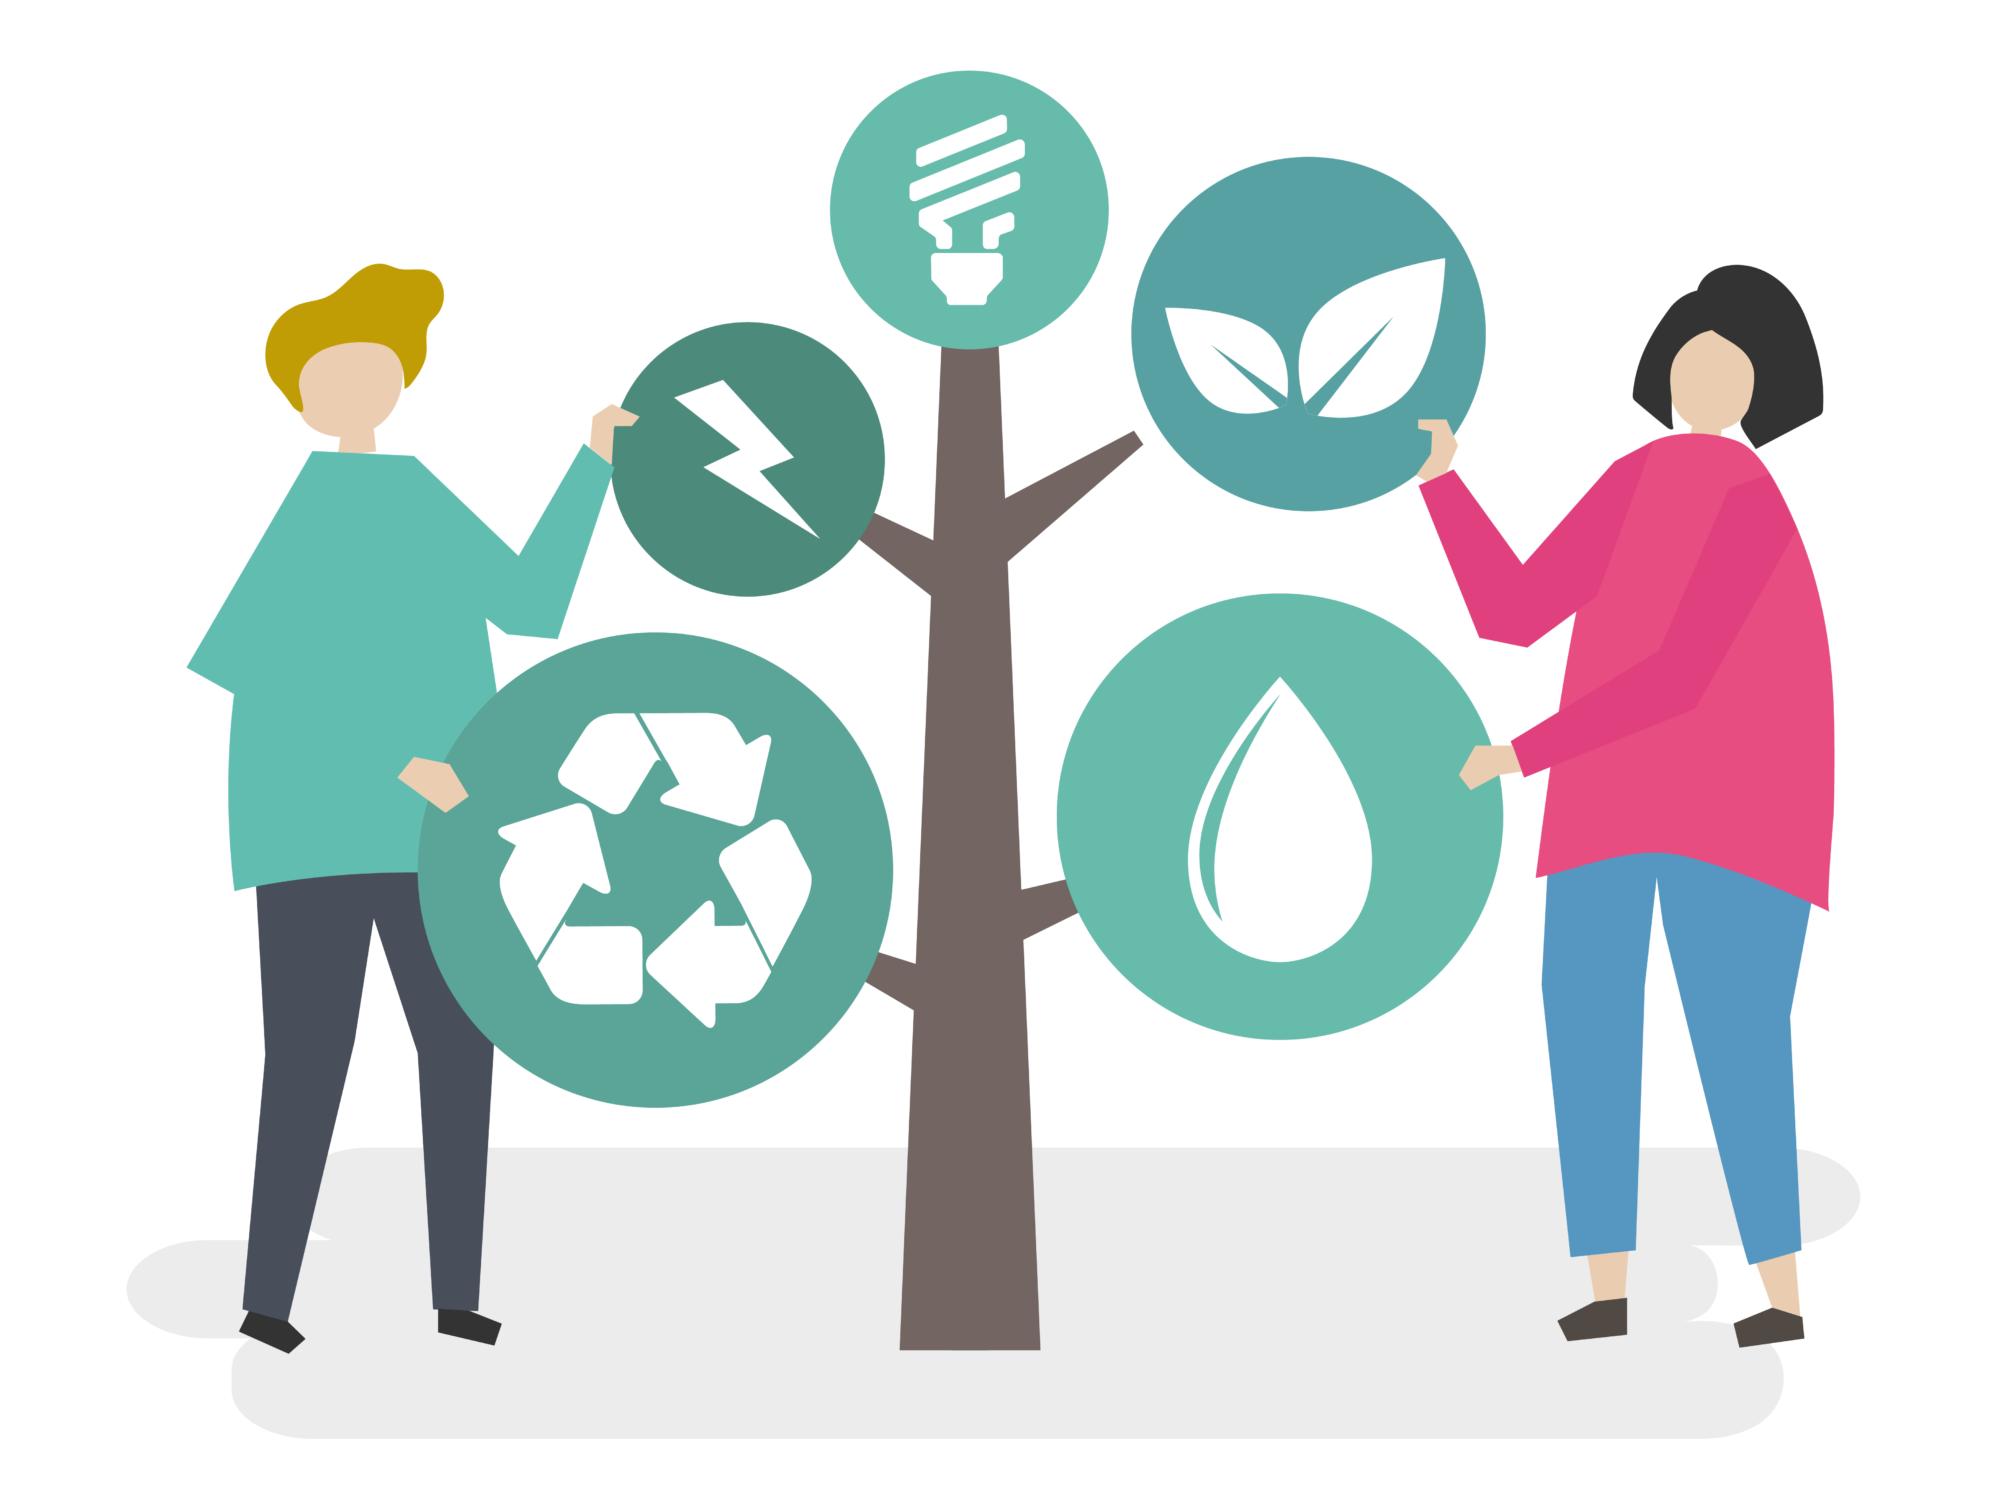 Medioambiental conservación empresas naturaleza